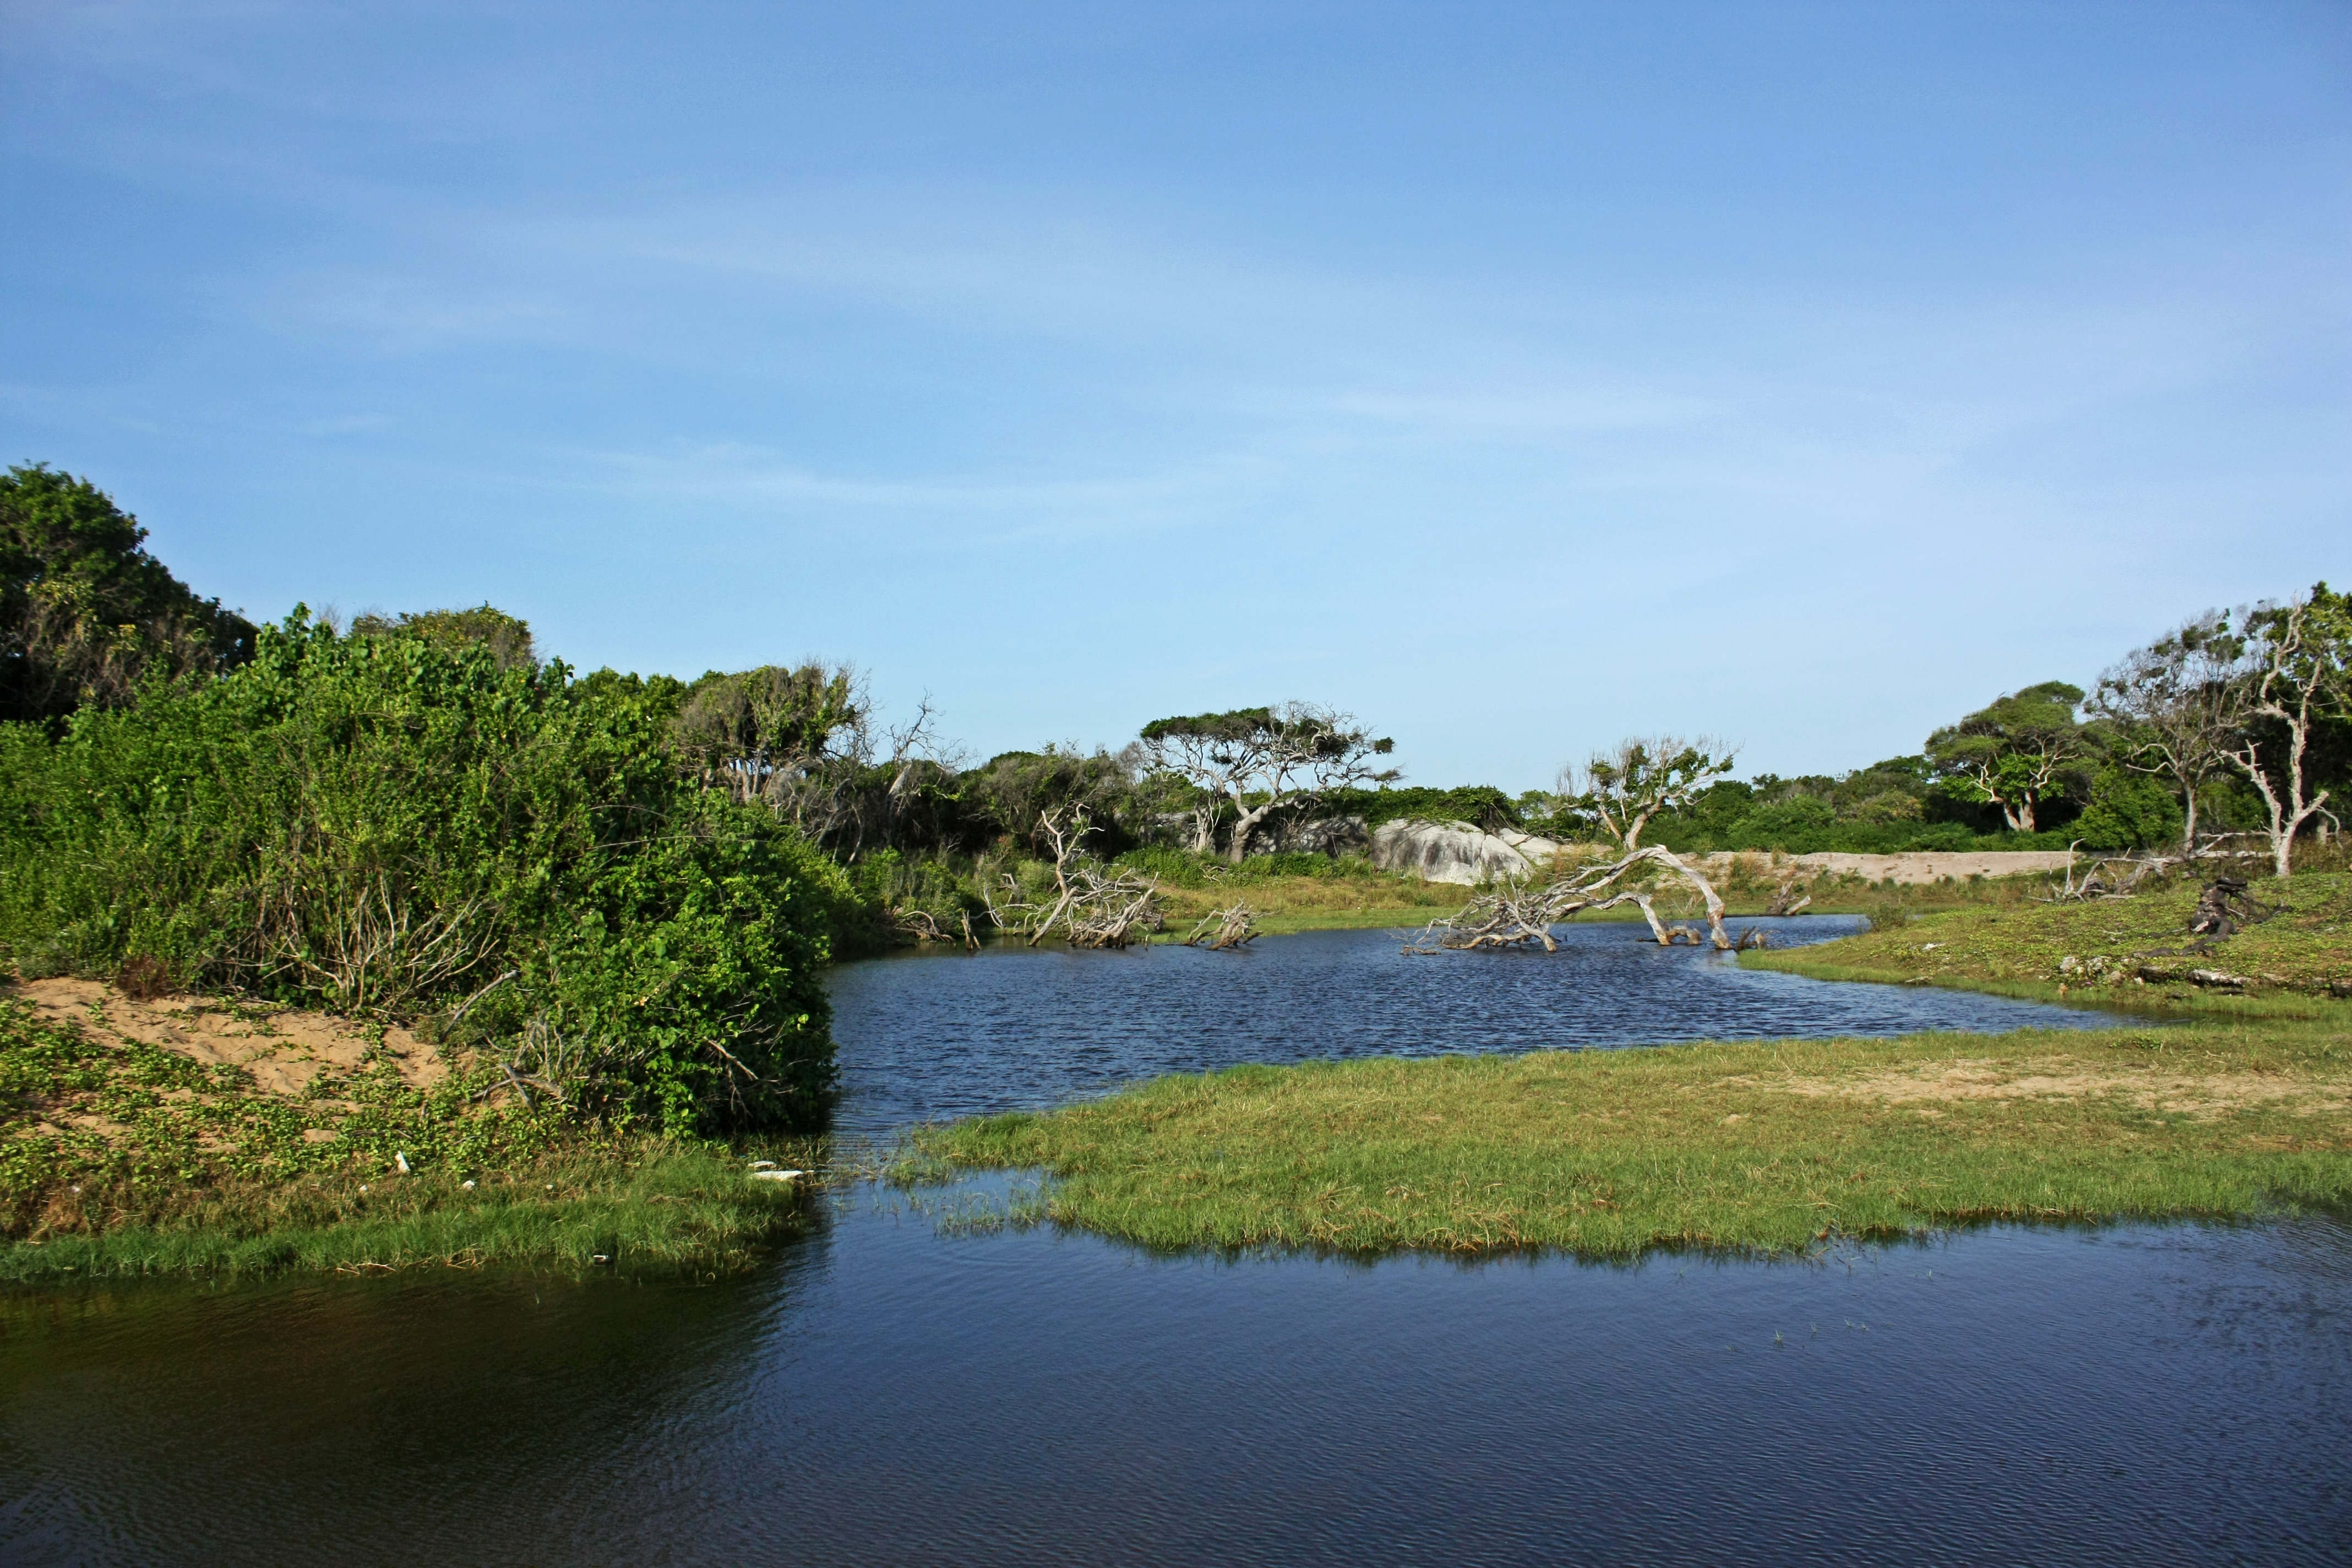 Kumana_National_Park_(Okanda)